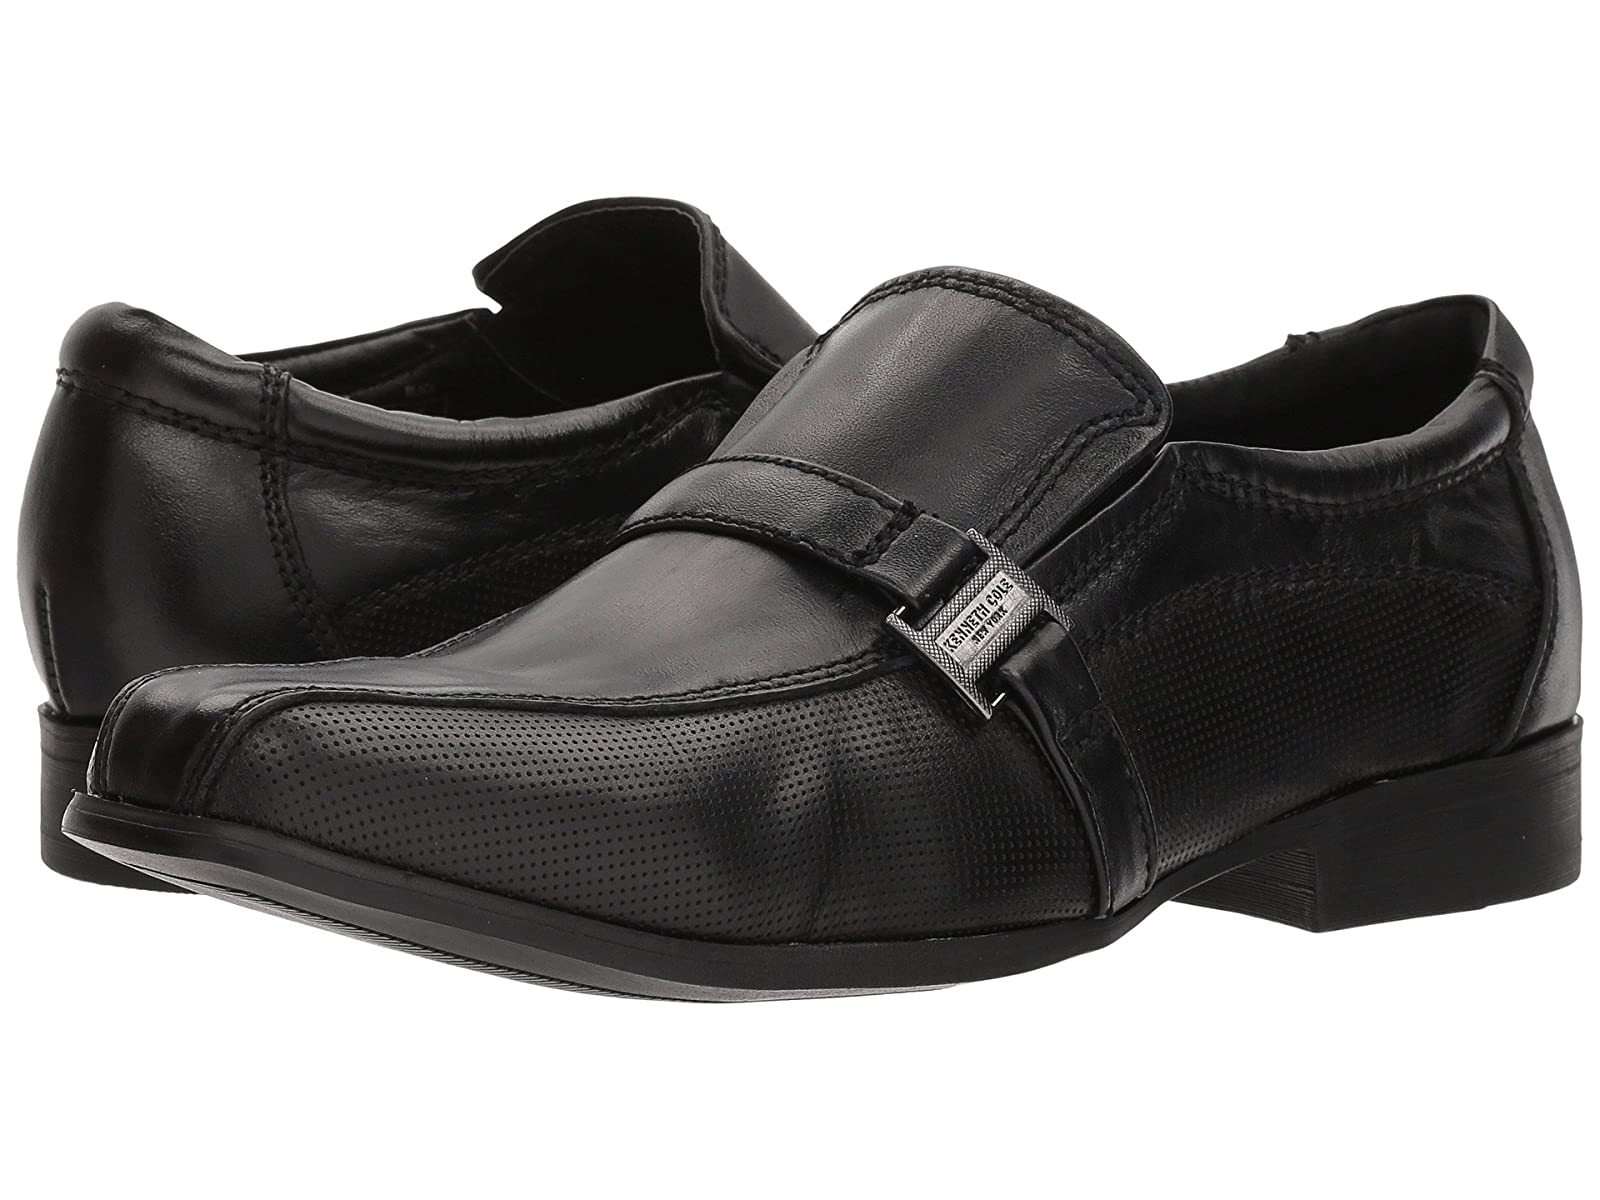 Kenneth Cole Reaction Kids Magic News (Little Kid/Big Kid)Atmospheric grades have affordable shoes